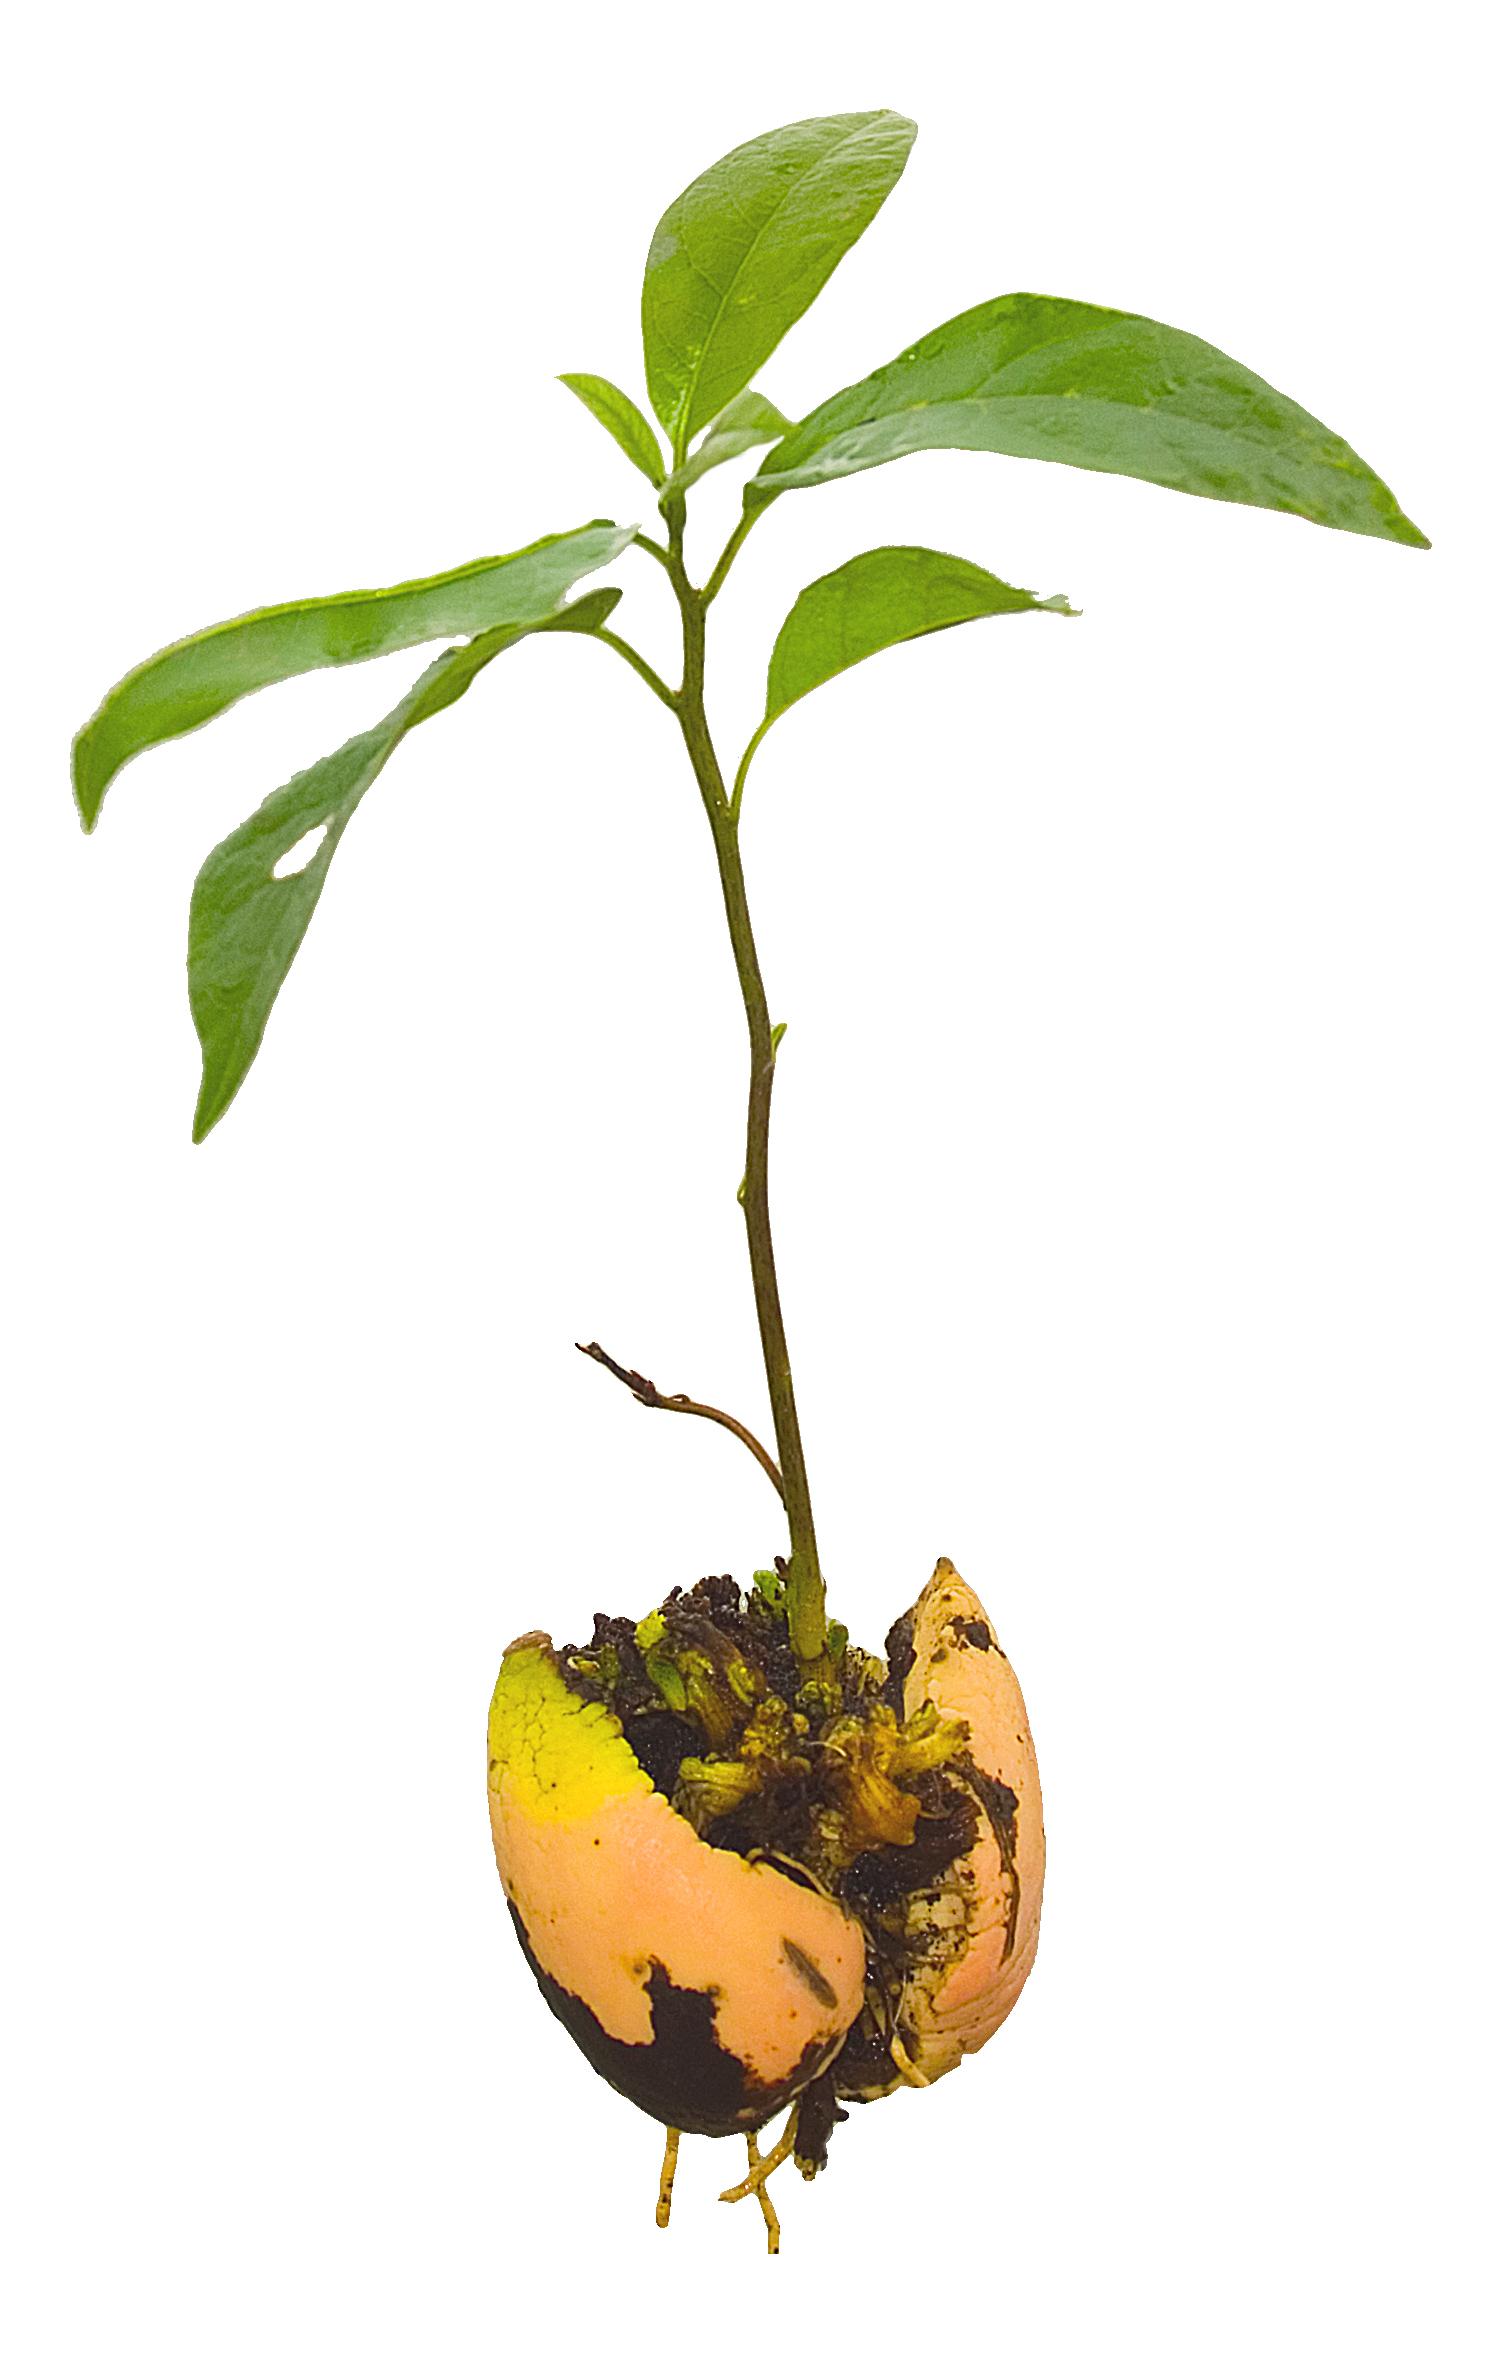 Avocado plant seedling